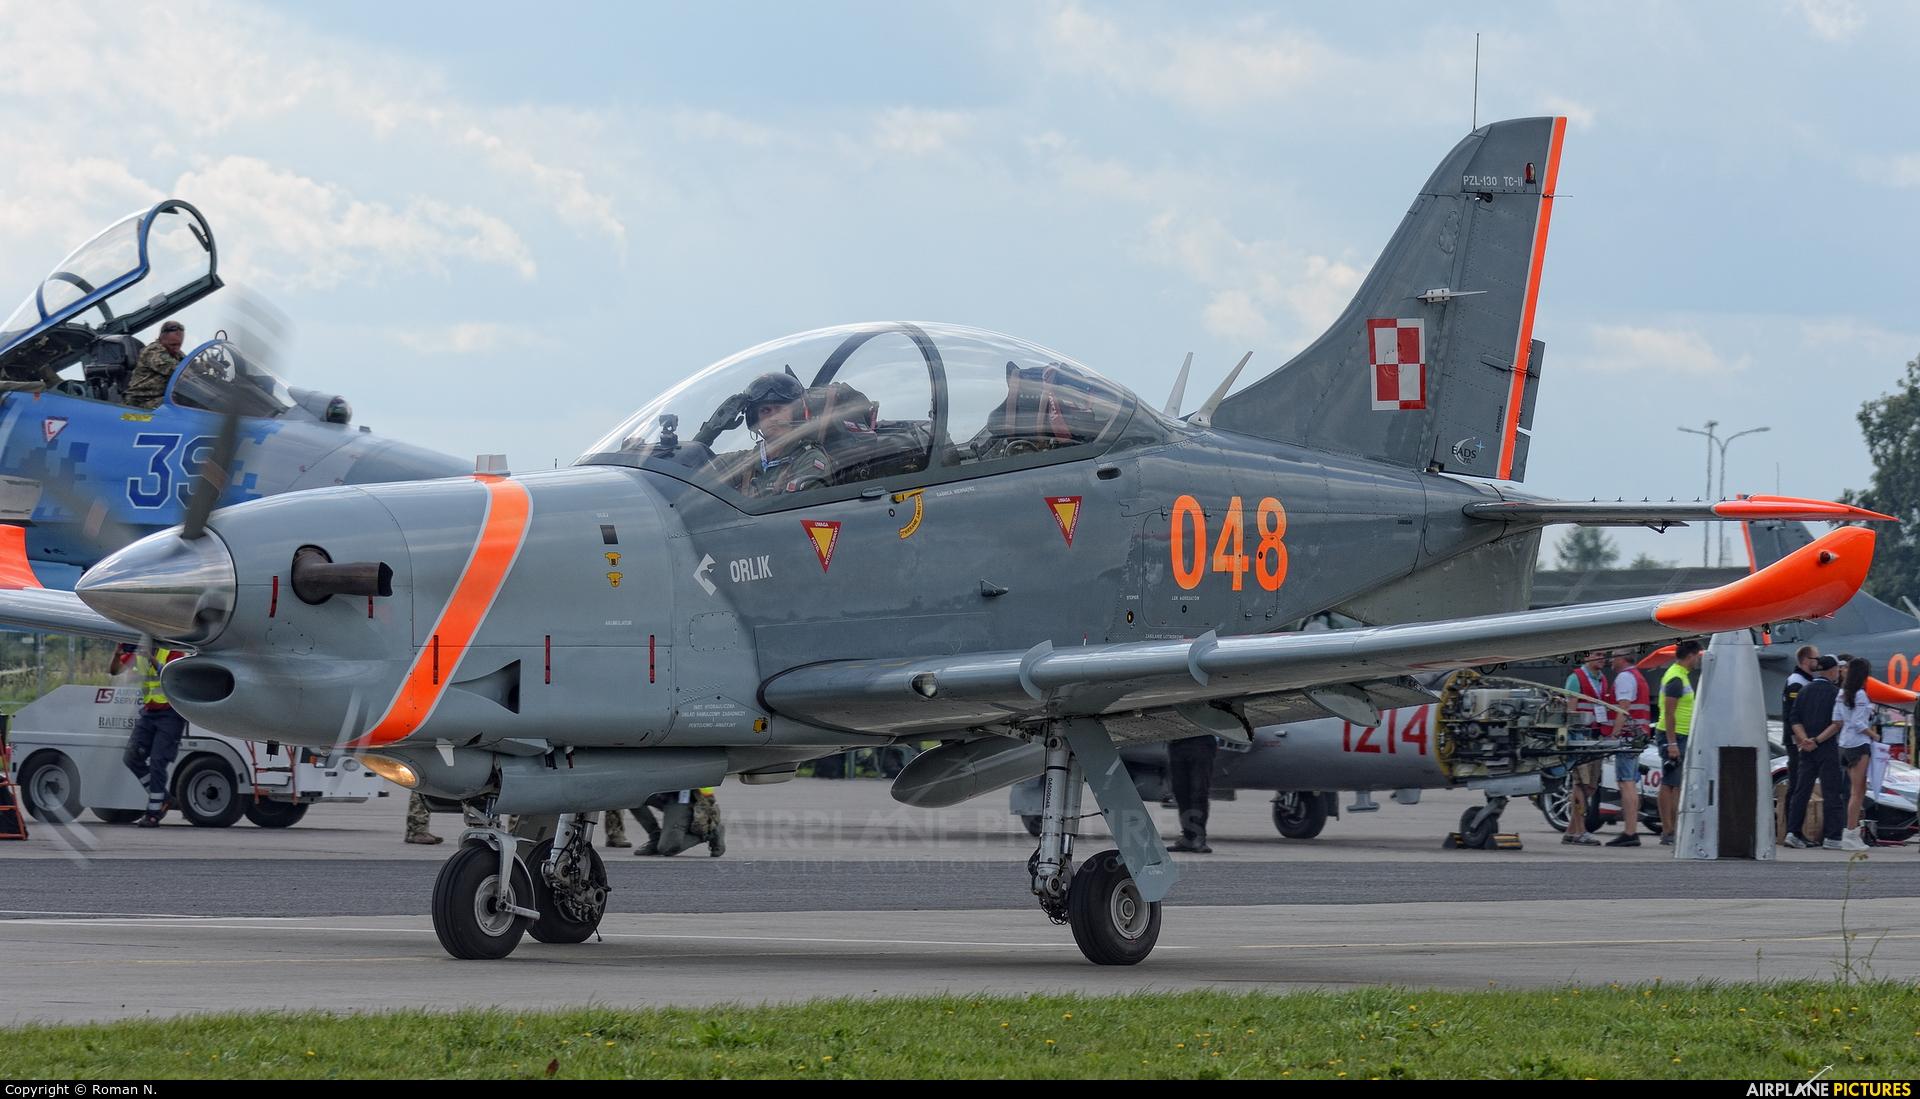 Poland - Air Force 048 aircraft at Gdynia- Babie Doły (Oksywie)